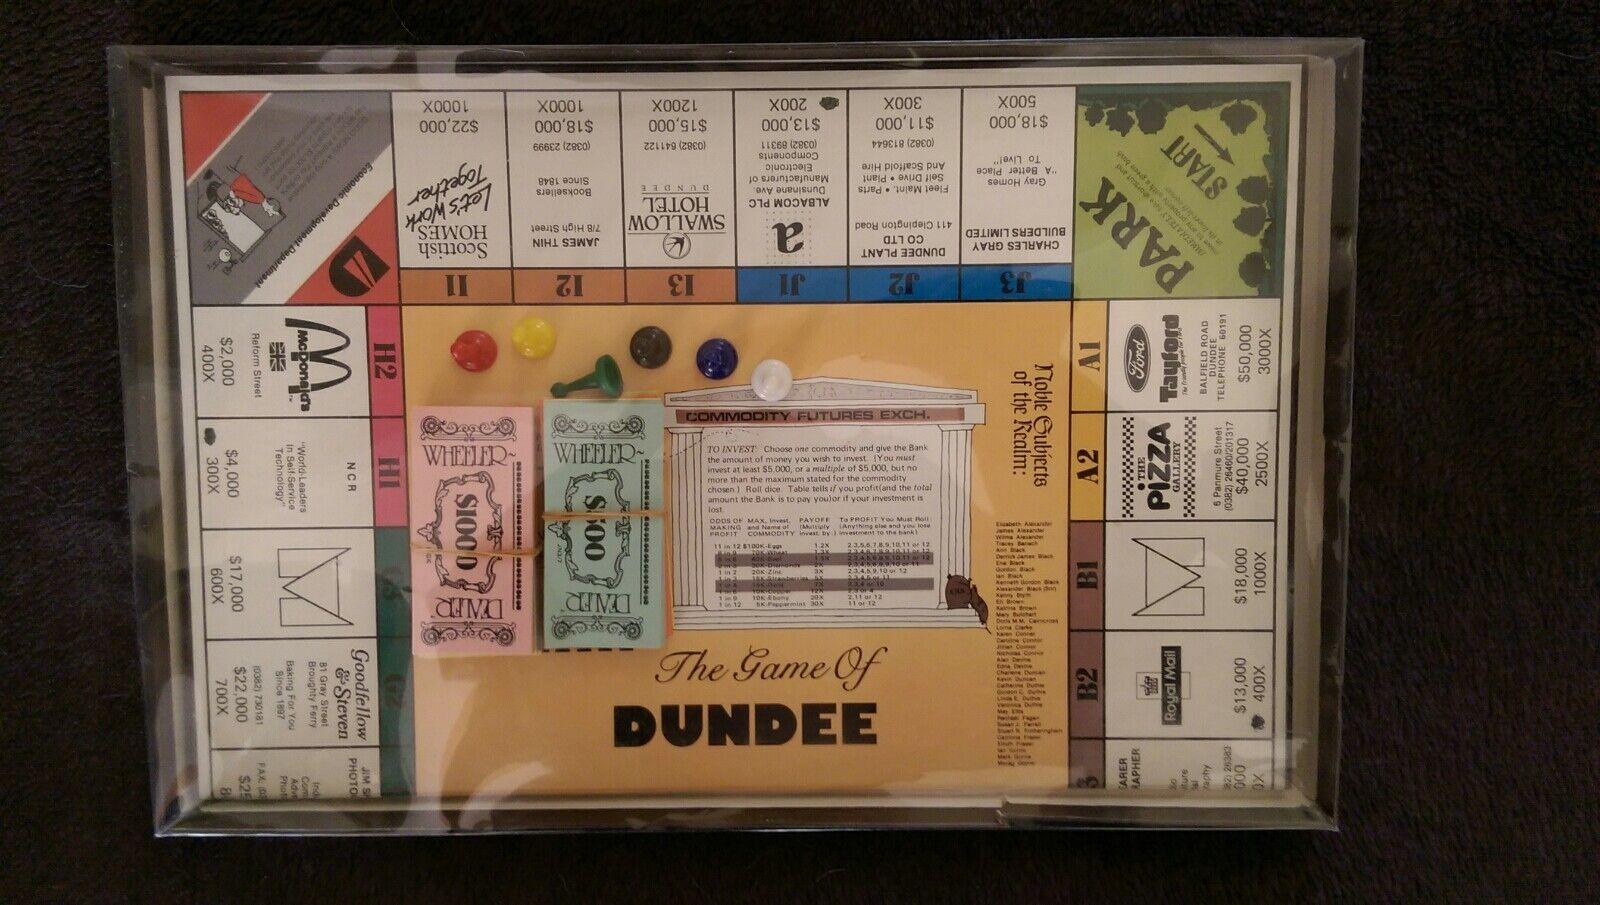 Wheeler Dealer The Game Of Dundee